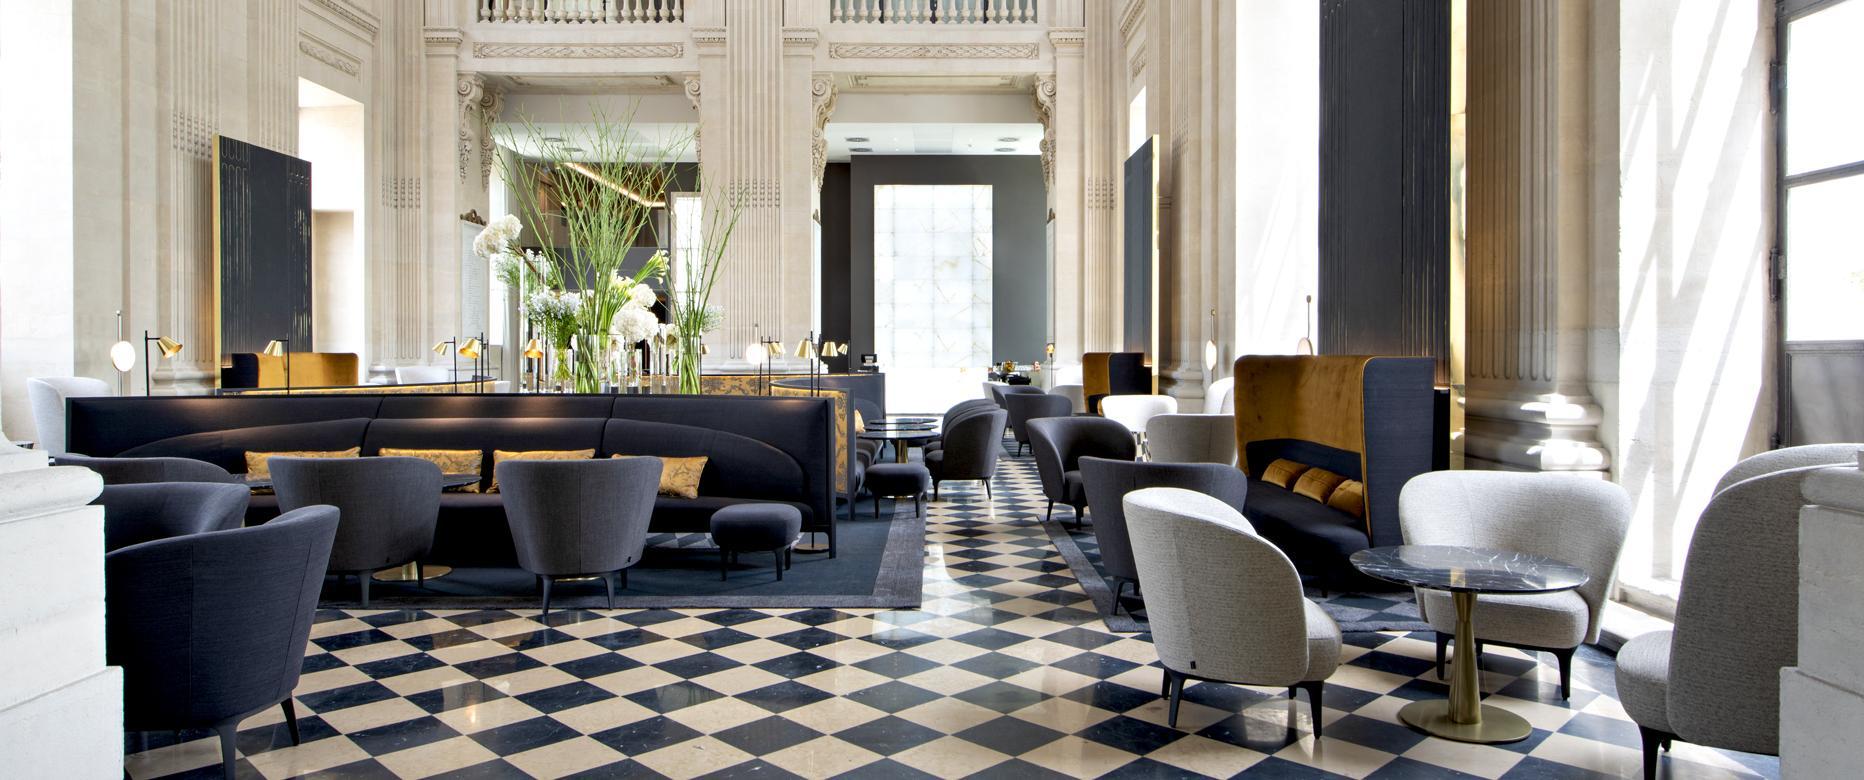 InterContinental Lyon – Hôtel Dieu Ligne Roset